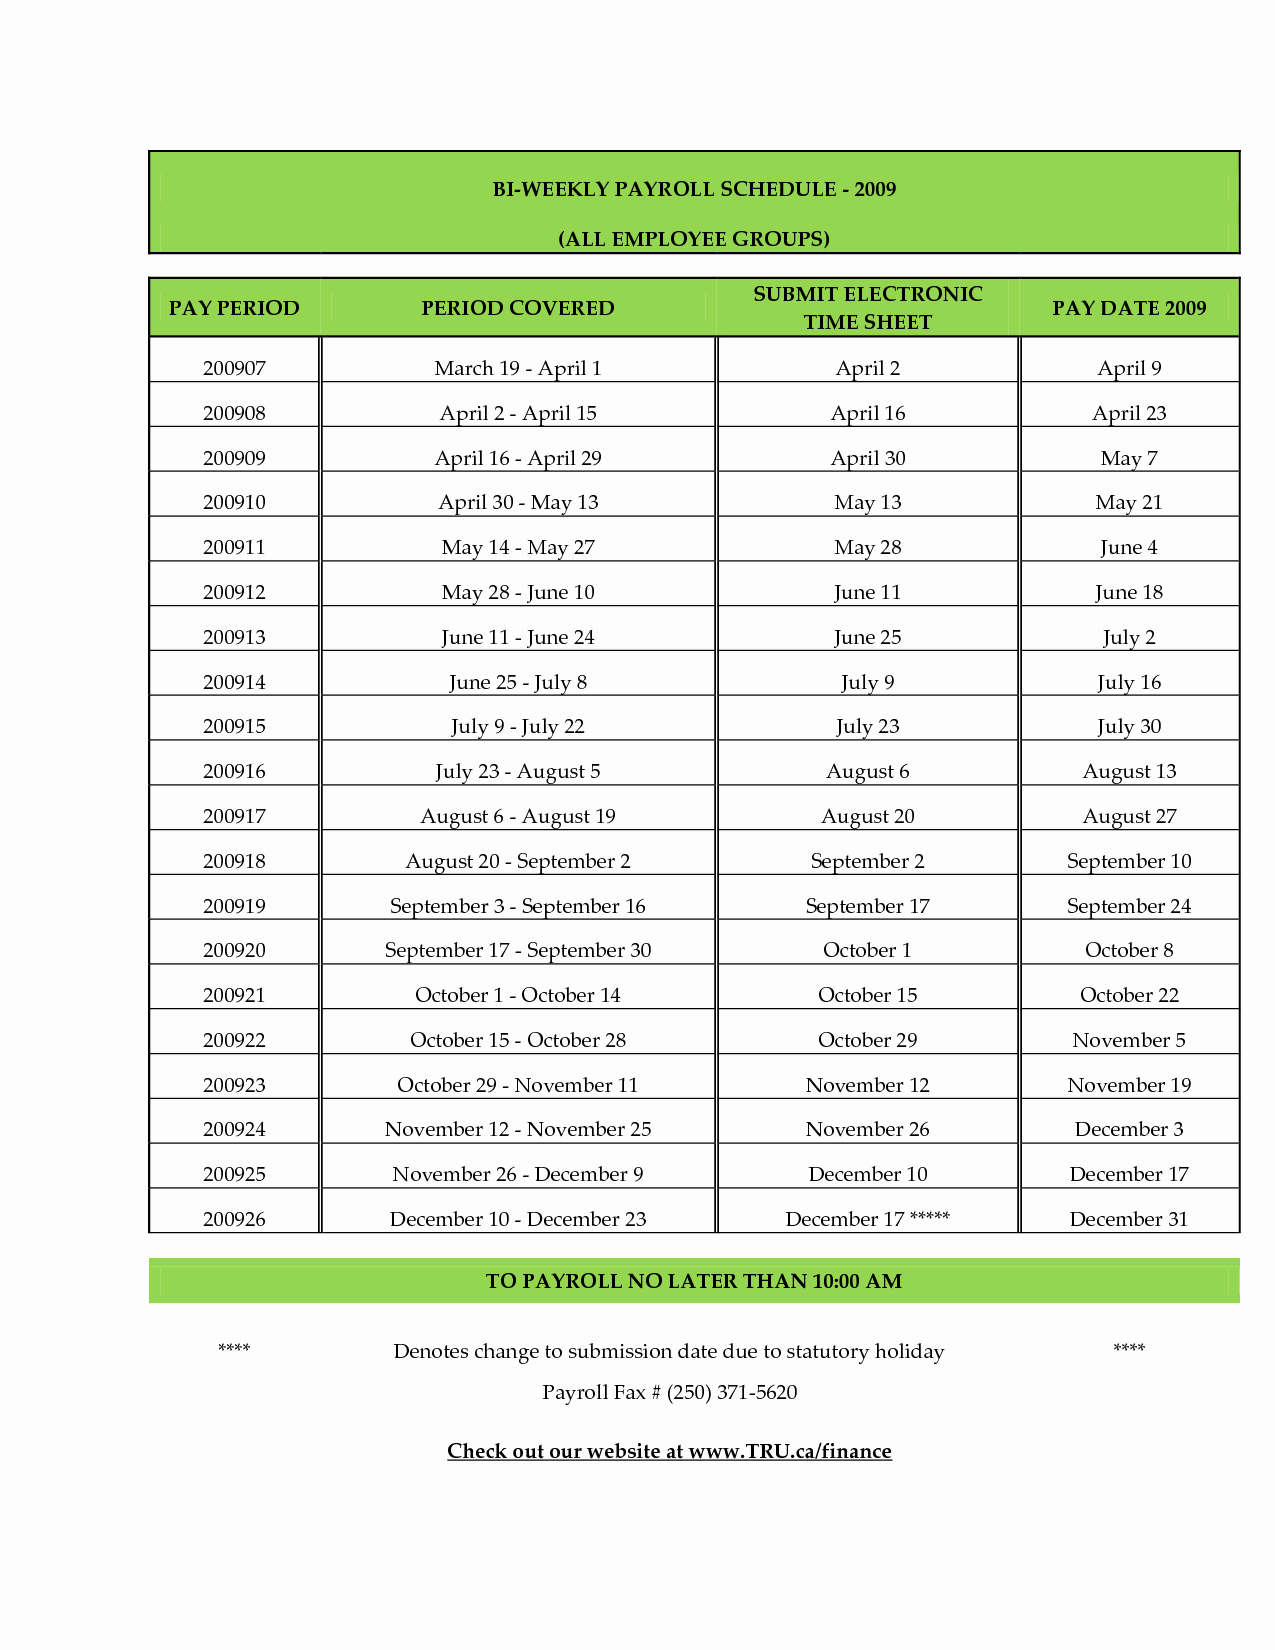 Biweekly Pay Schedule Template Luxury Employee Leave Calendar 2017